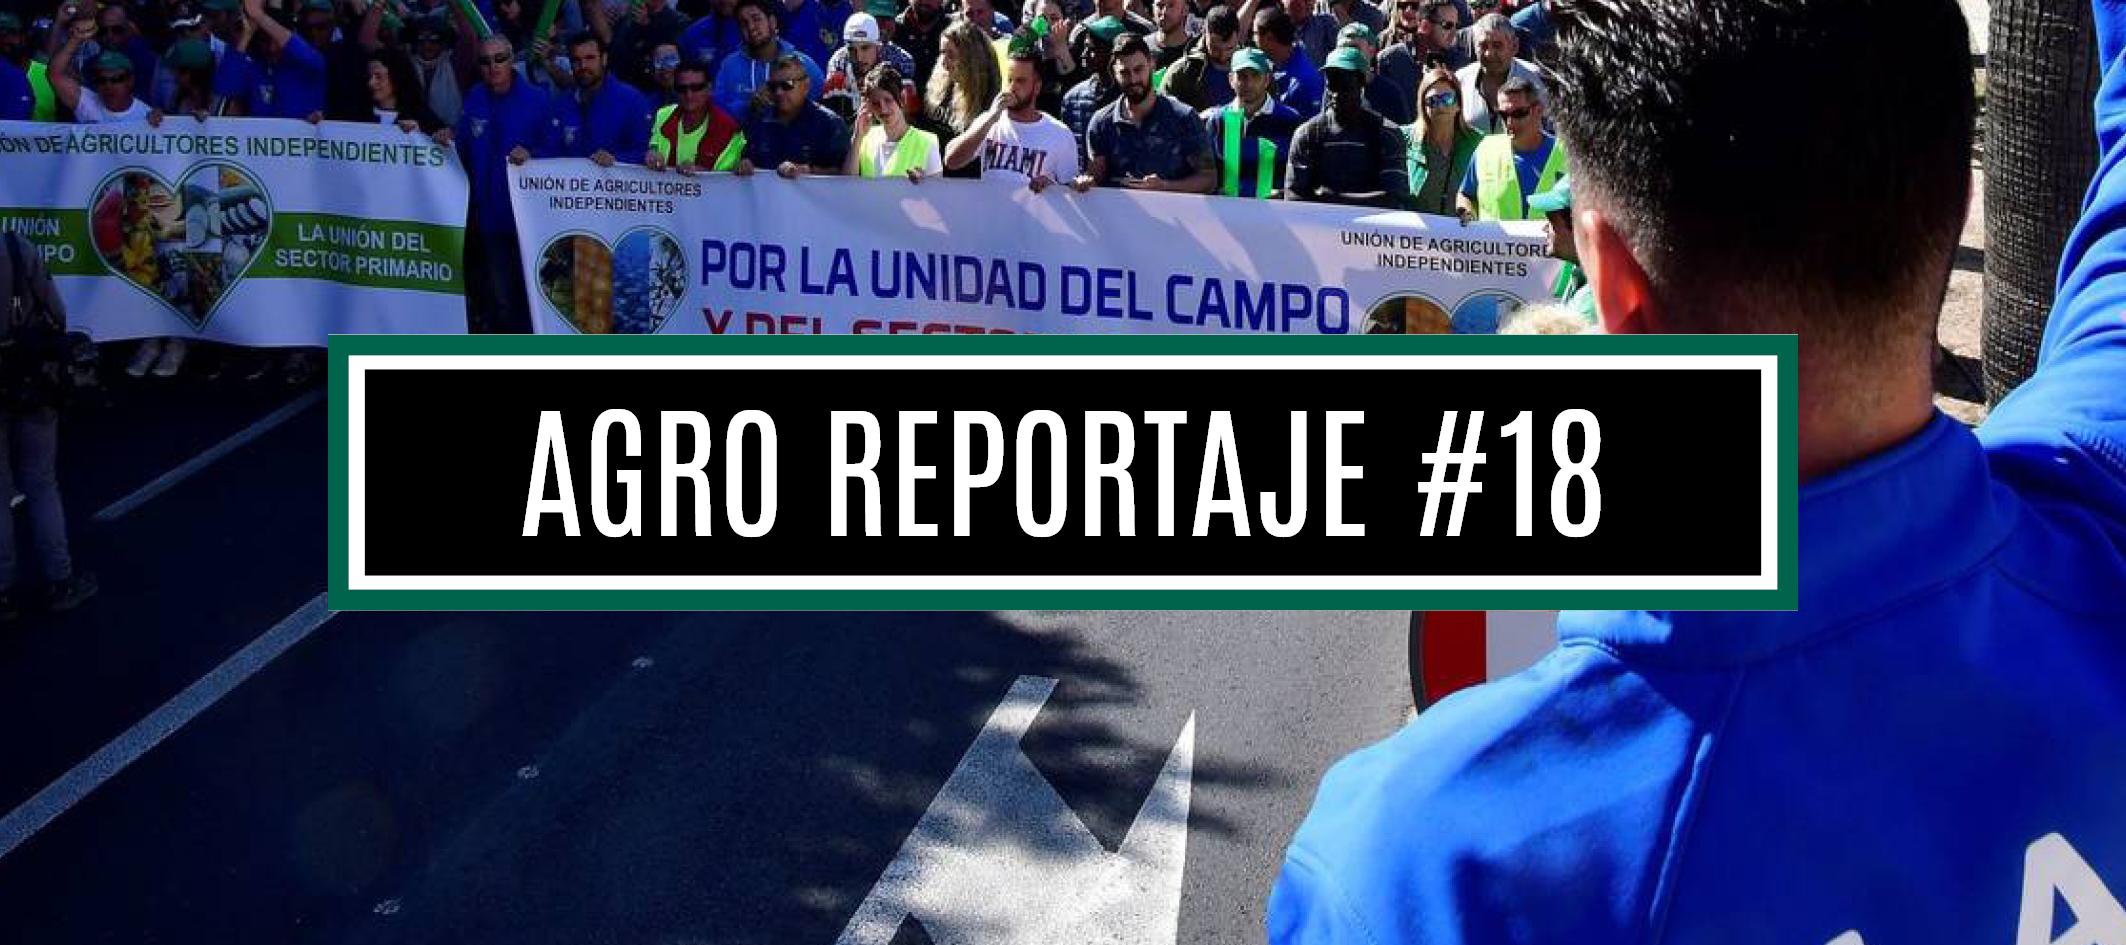 AGRO REPORTAJE #18 (WEB)